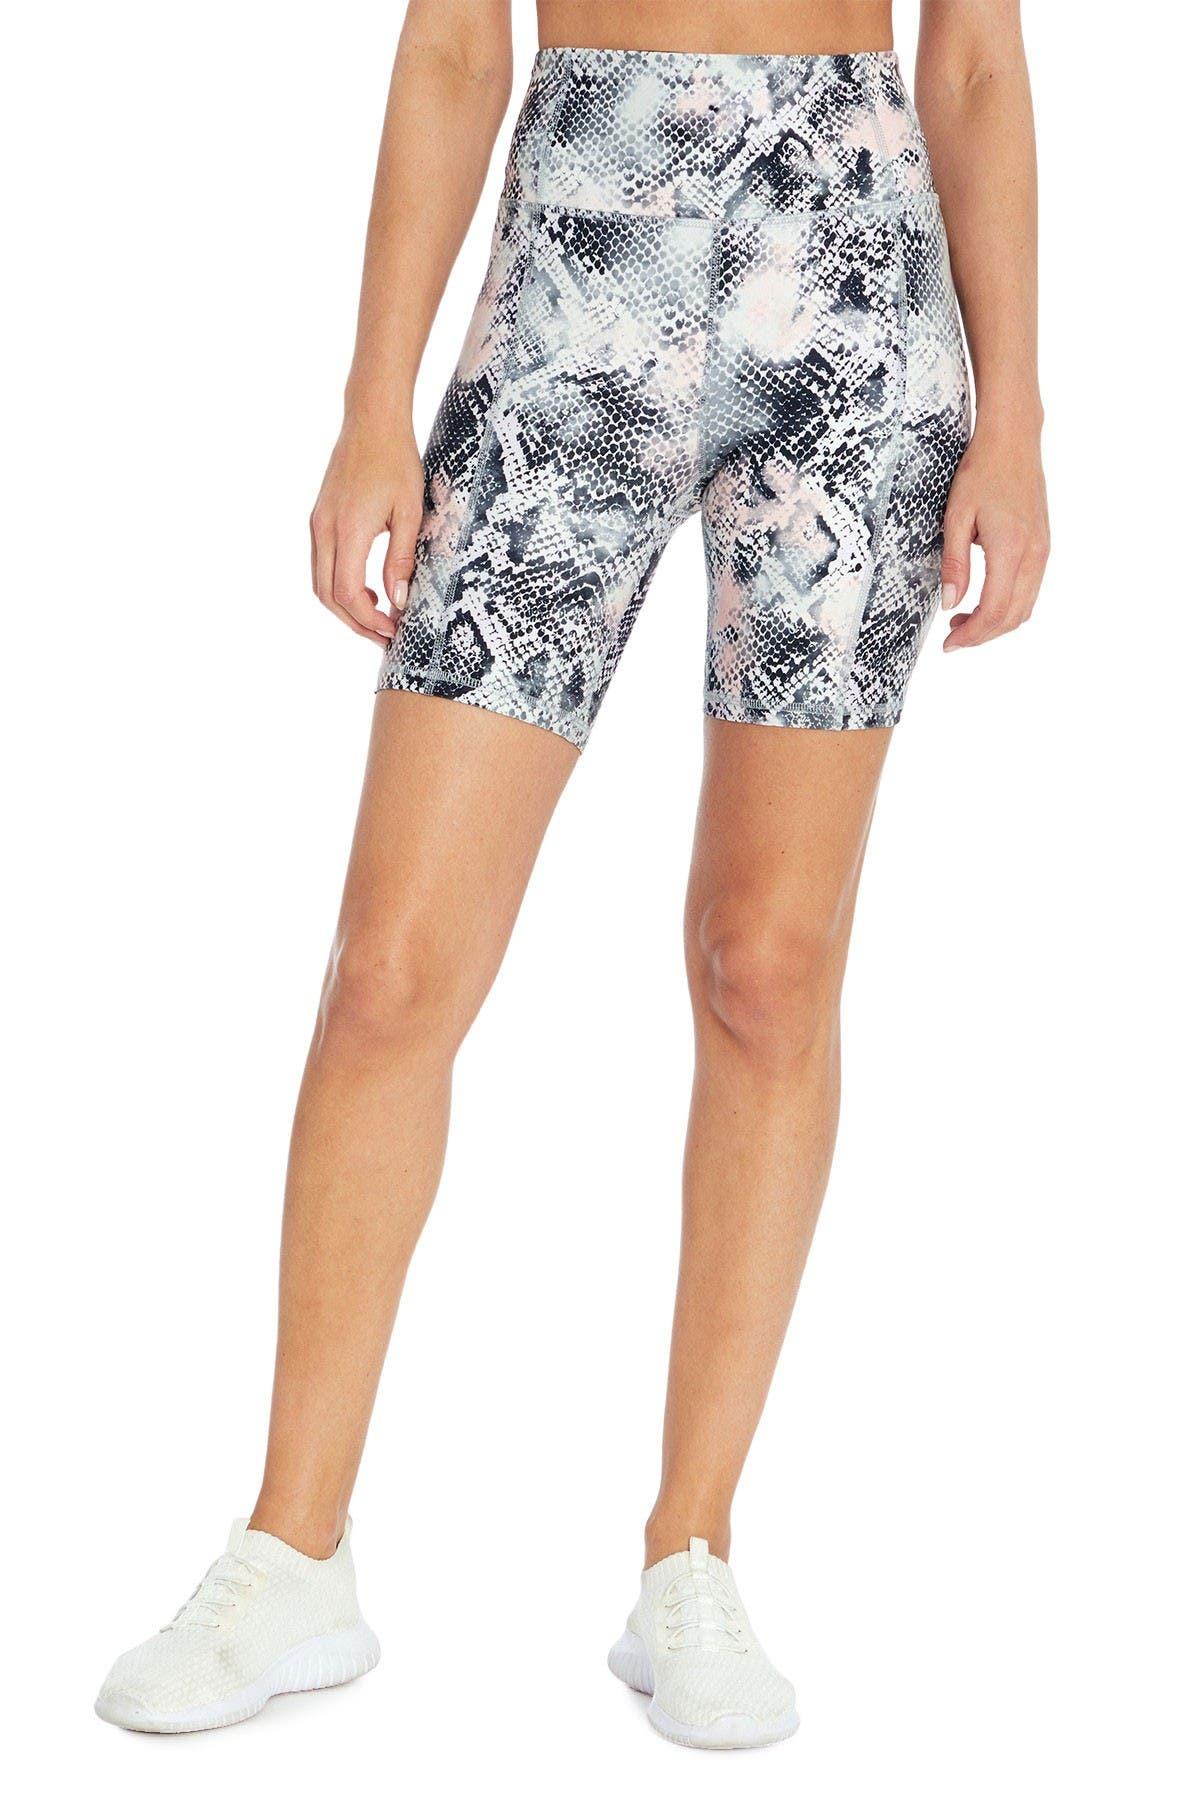 Image of Jessica Simpson High Waisted Biker Shorts